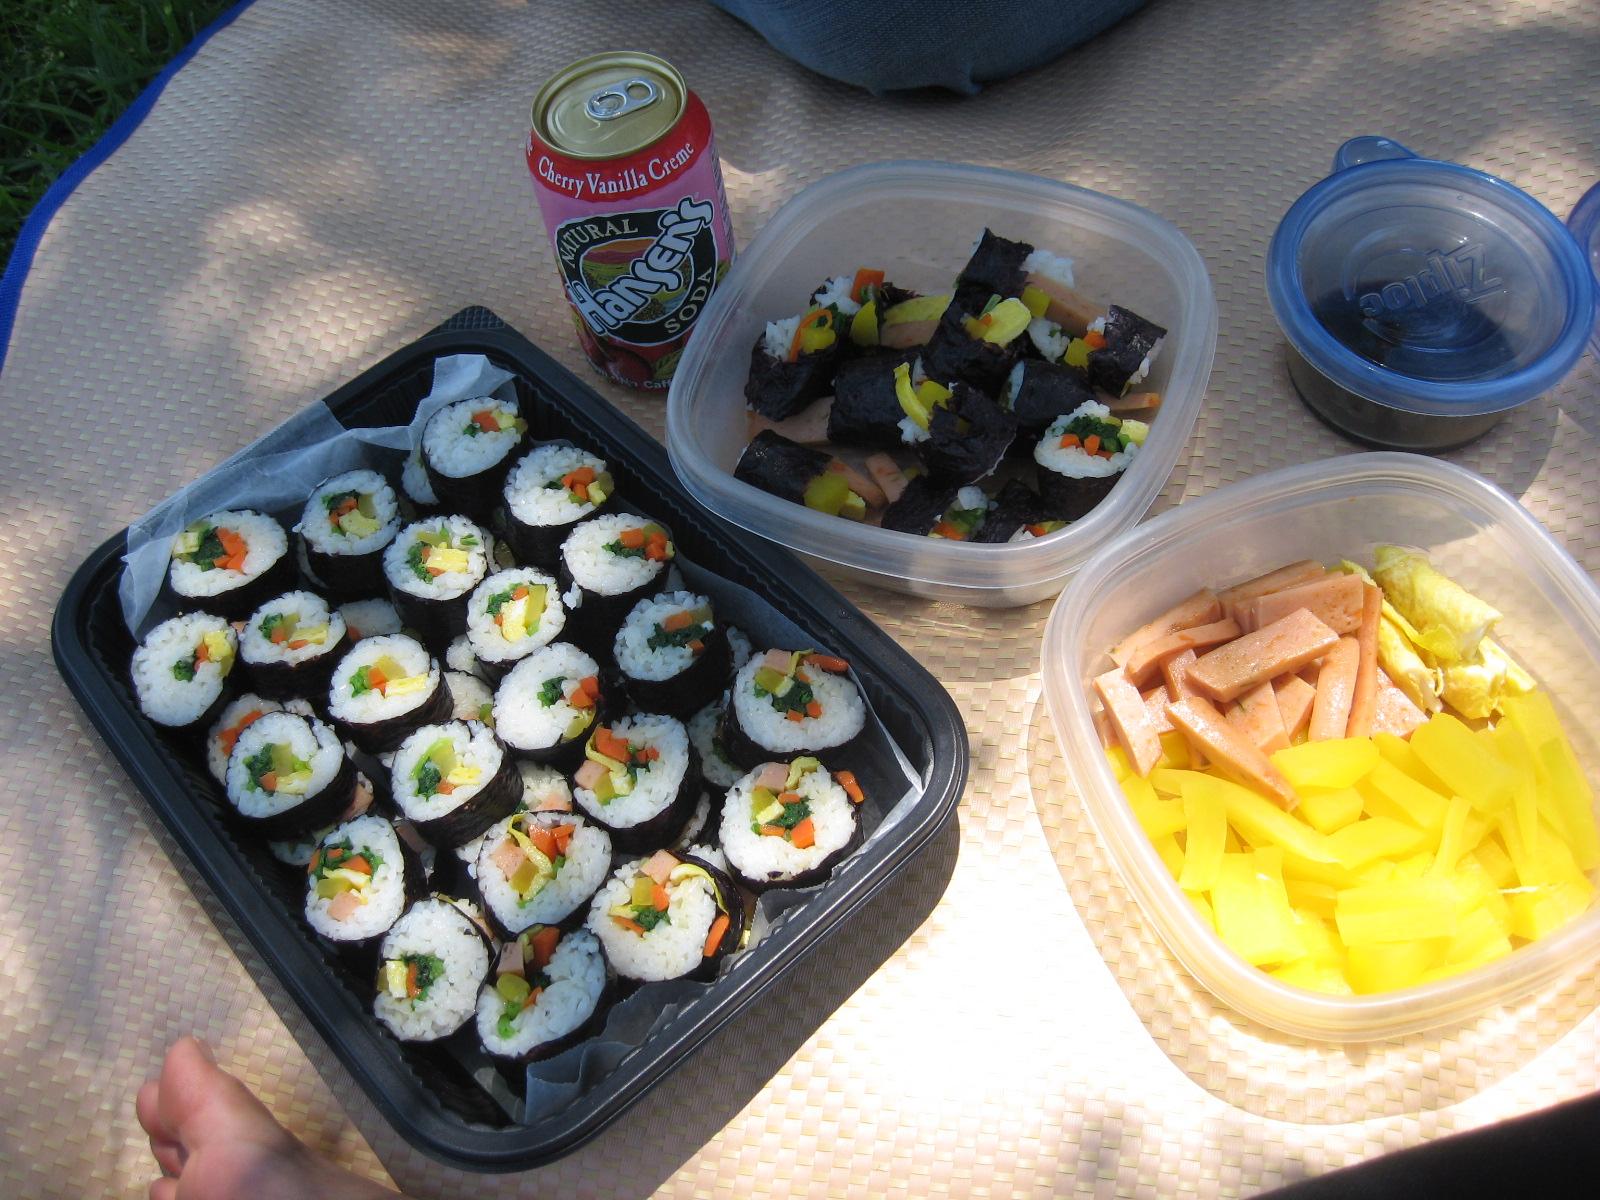 Korean style picnic!